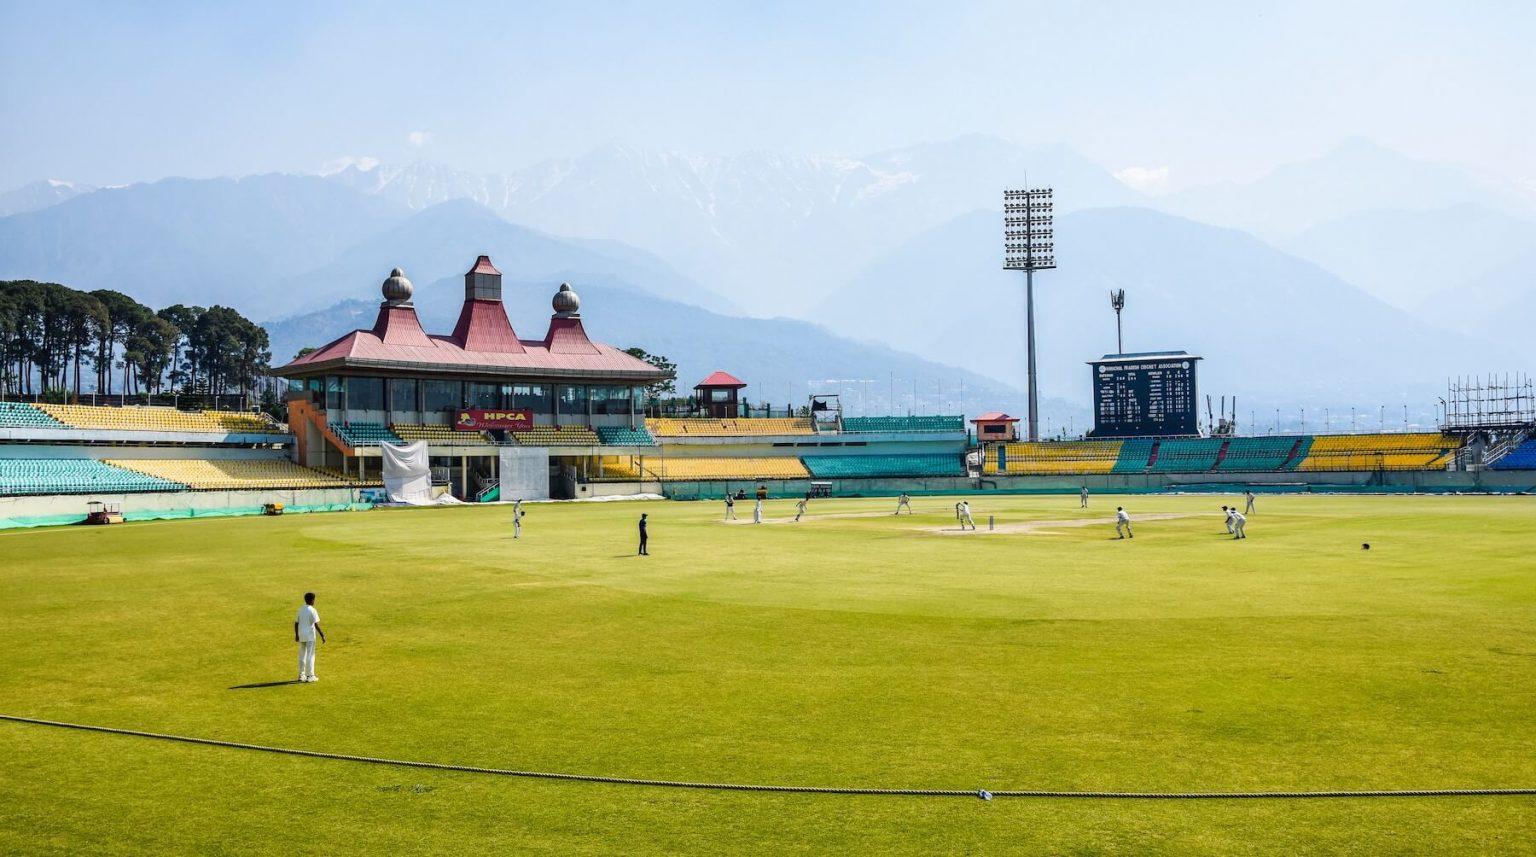 Himachal Pradesh Cricket Stadium